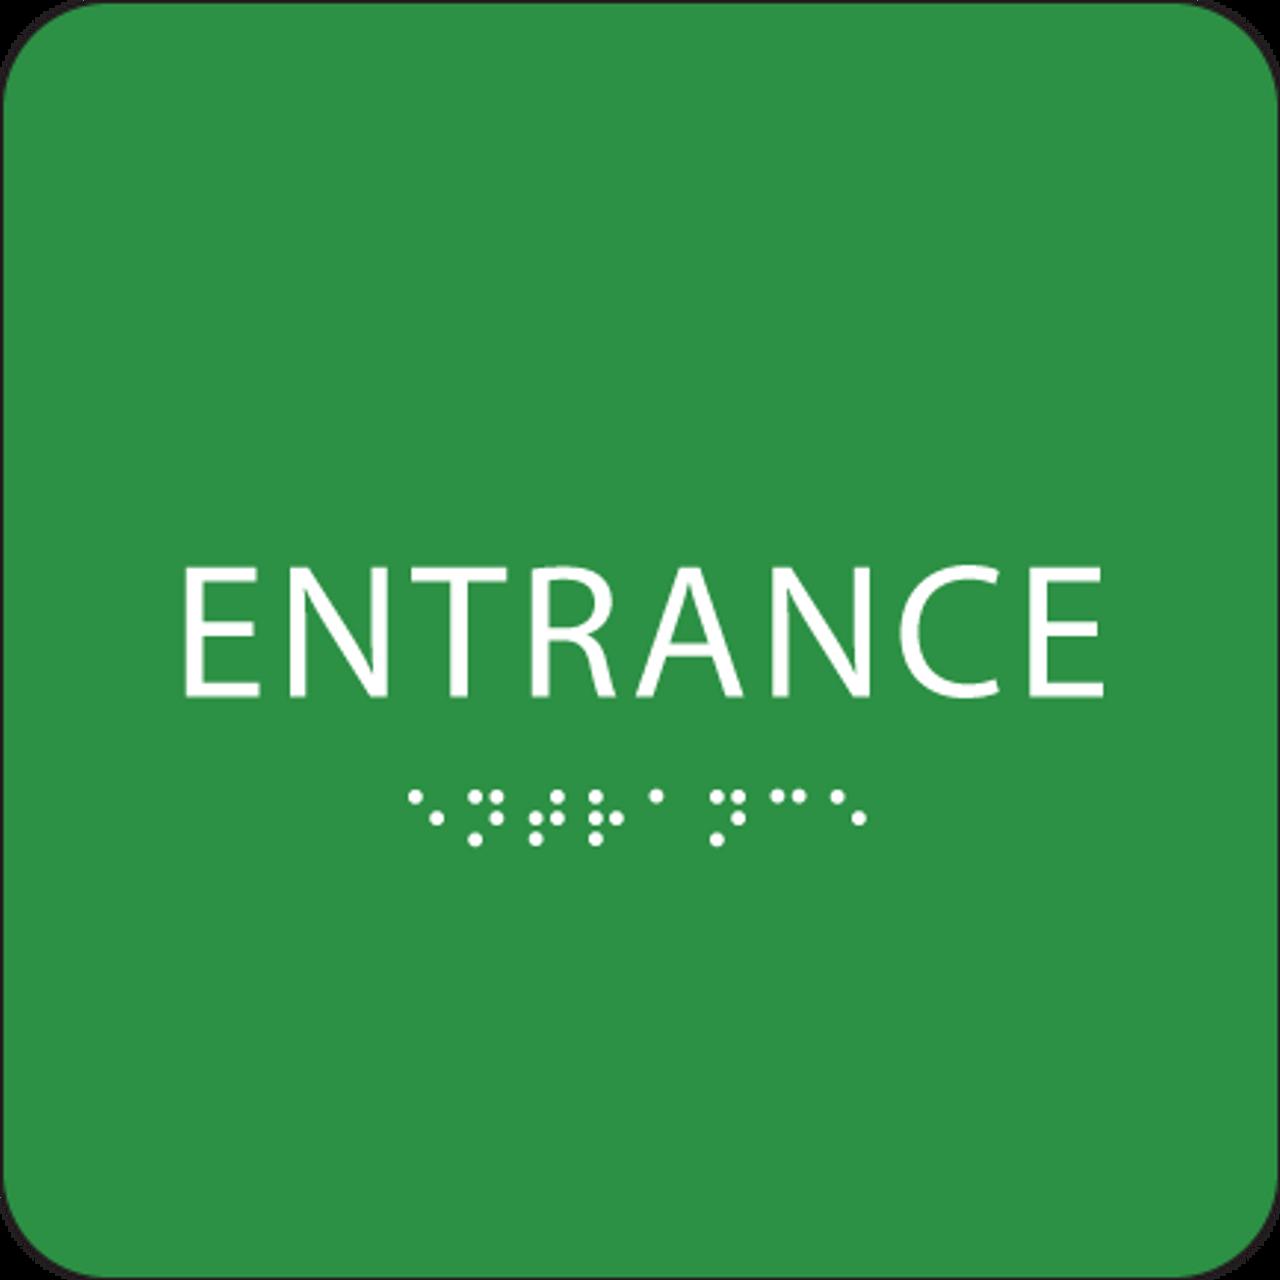 Green ADA Entrance Sign